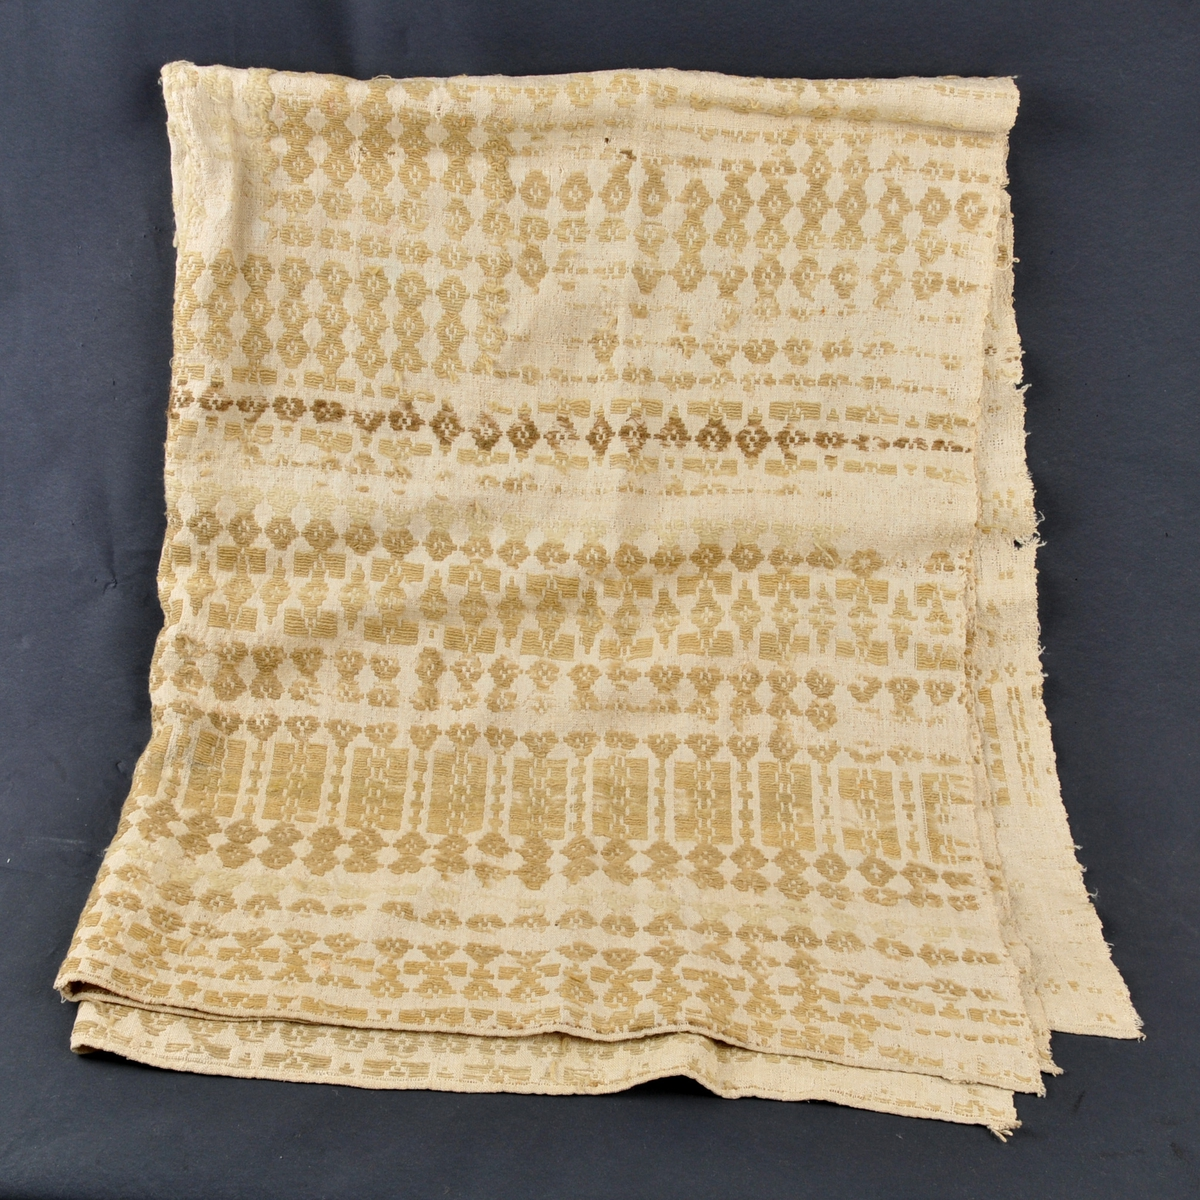 Teppe er vove i to bredder og sauma saman. Mønster/dekor er sauma.